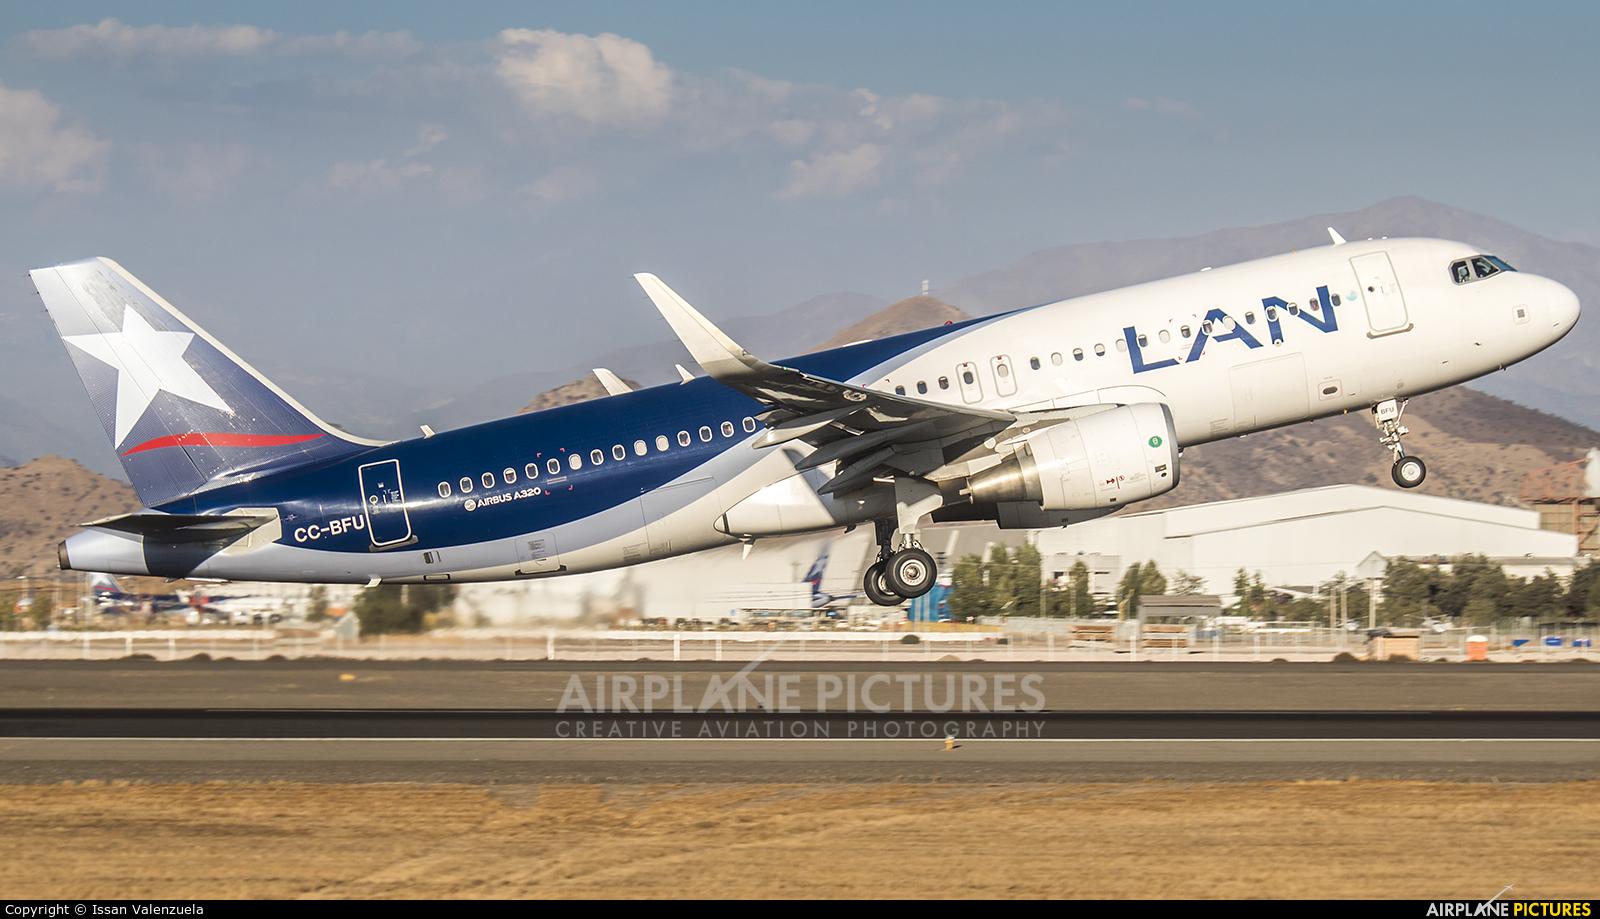 LAN Airlines CC-BFU aircraft at Santiago de Chile - Arturo Merino Benítez Intl